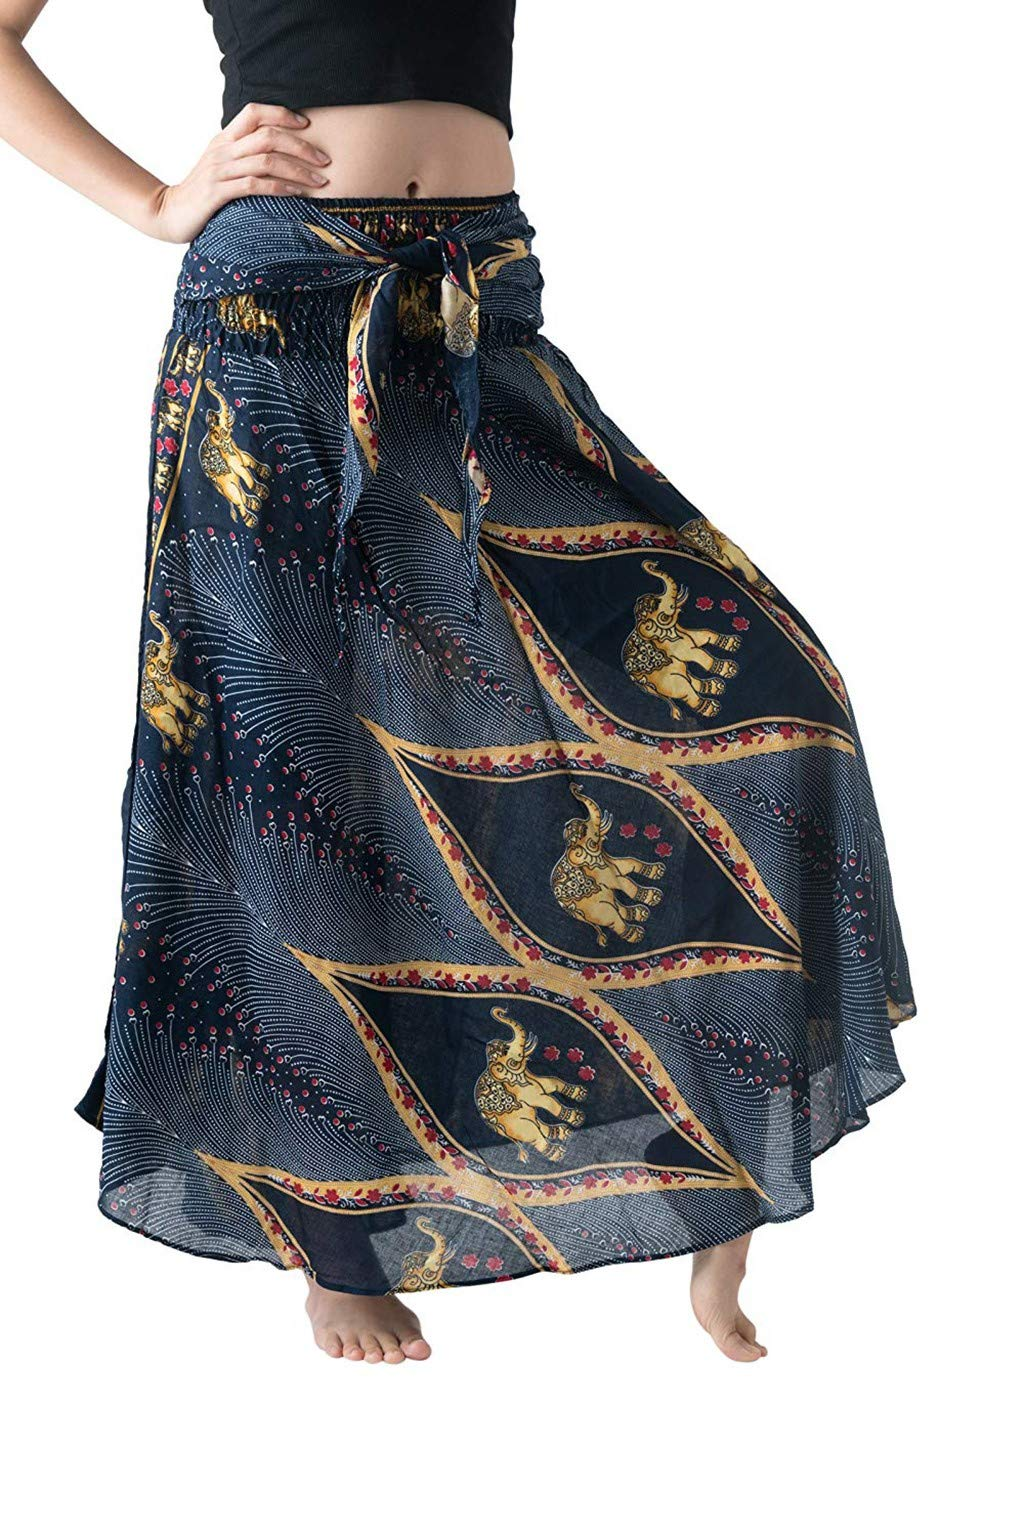 Women Maxi Skirt Long Hippie Bohemian Gypsy Boho Flowers Elastic Waist Floral Skirt Loose Swing Skirt Sundress Navy by UCQueen